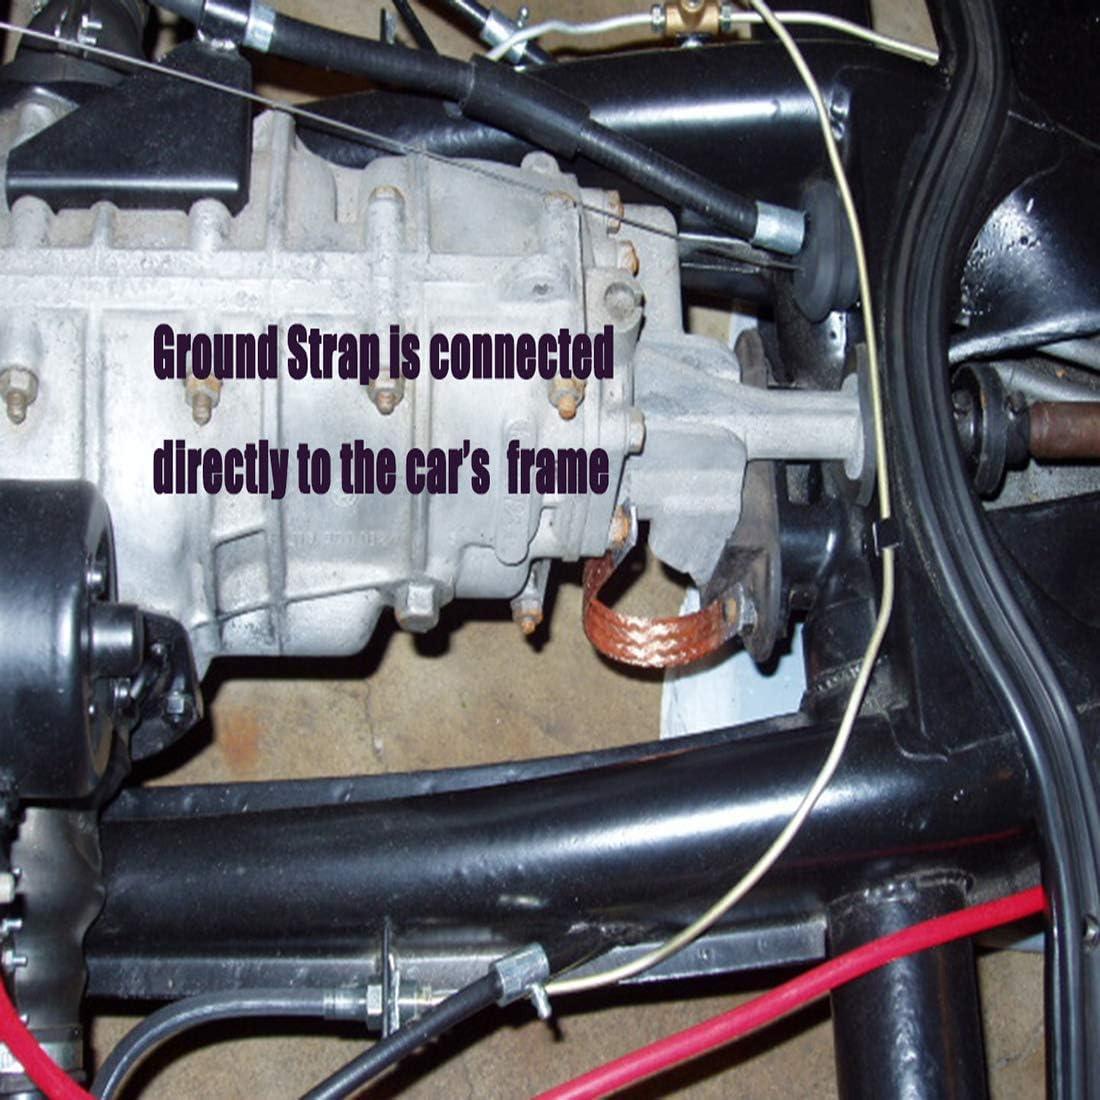 Multi-Purpose Universal Braided Copper Grounding Strap for Truck Automotive 29cm 10PCS 11.4